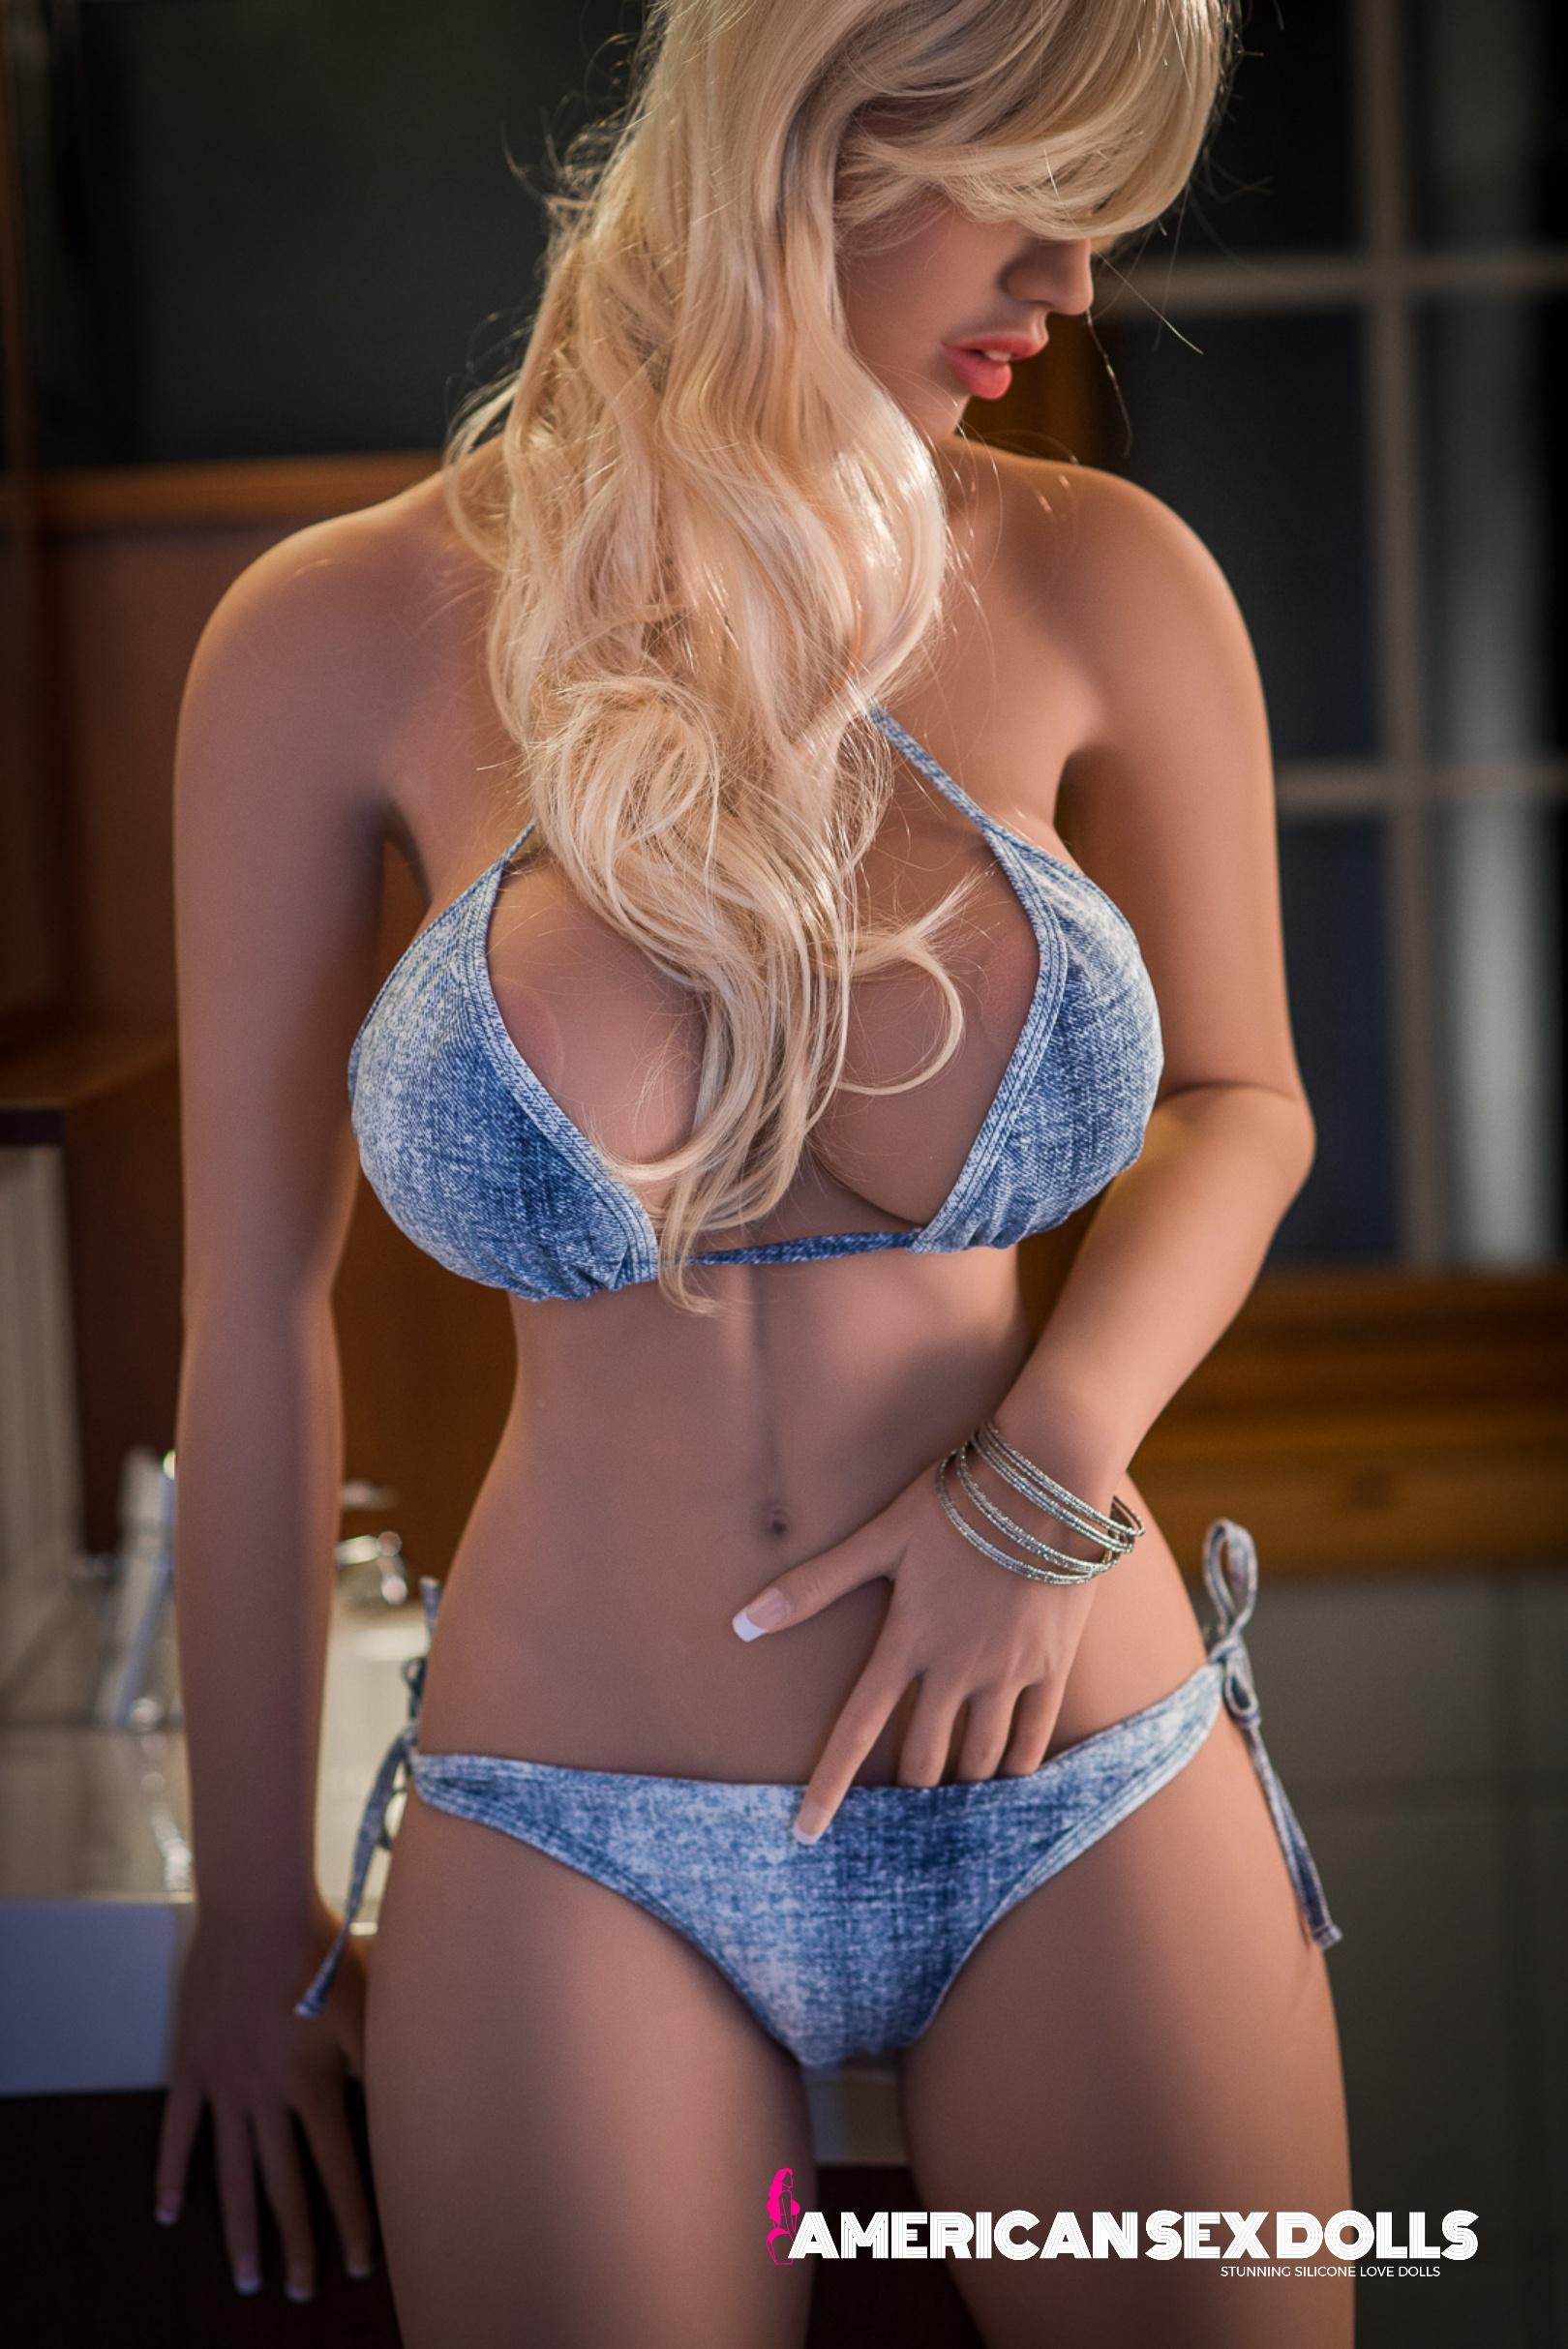 American Sex Doll 170cm blonde (5).jpg